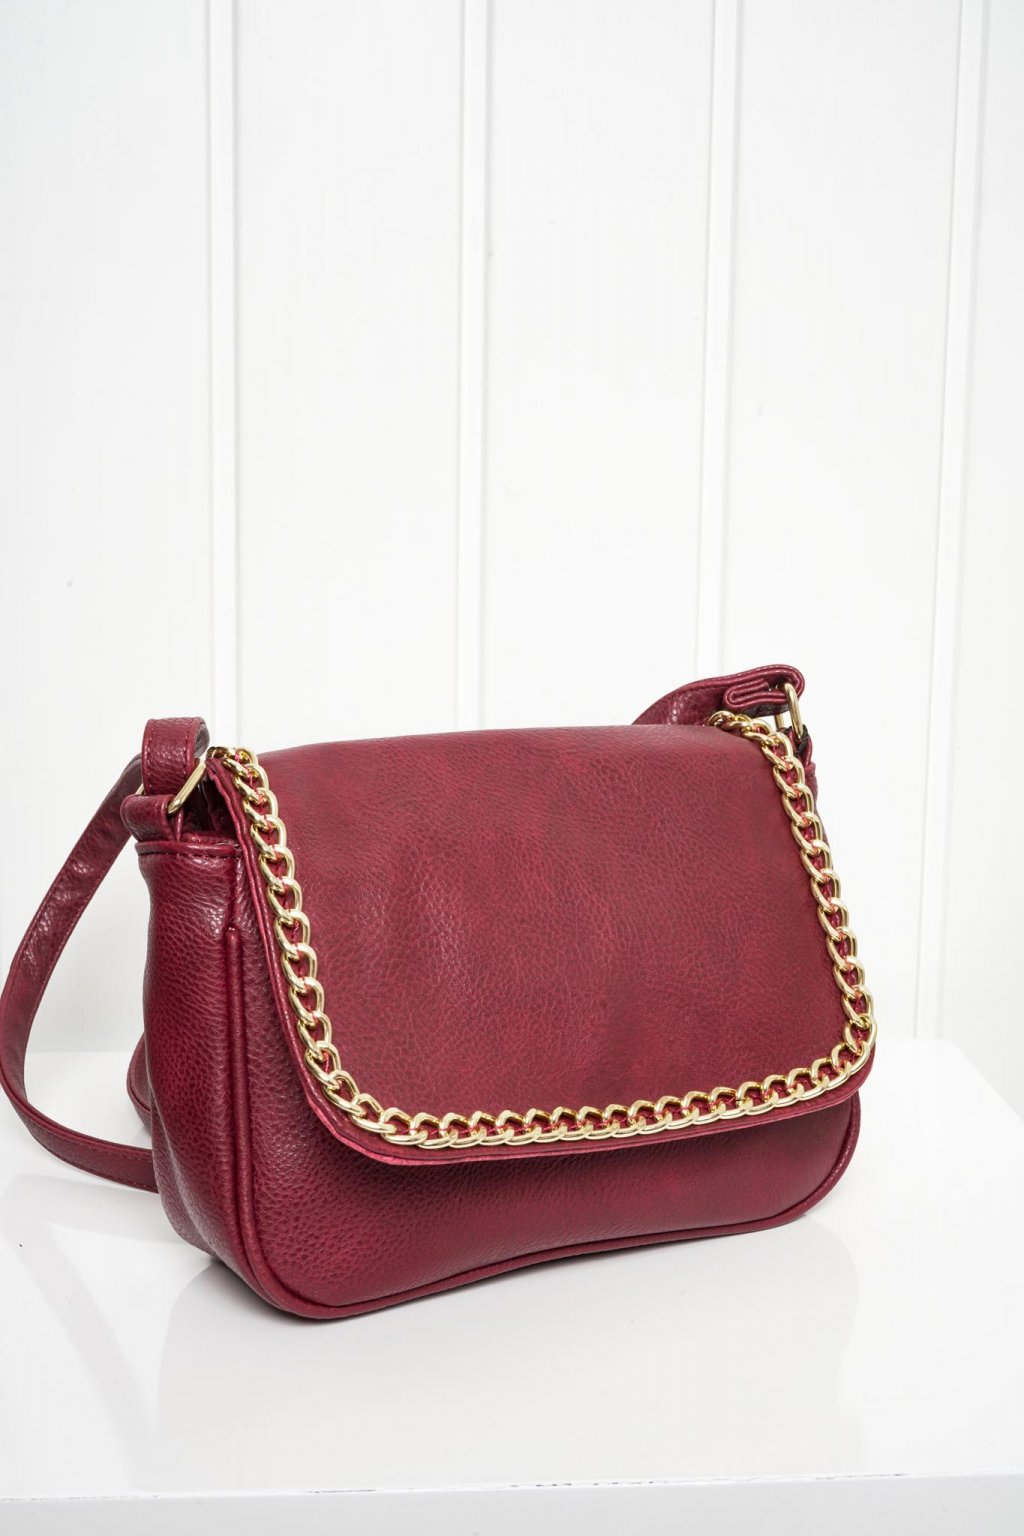 Kabelka, crossbody, ruksak, shopping bag, shopperka, 619